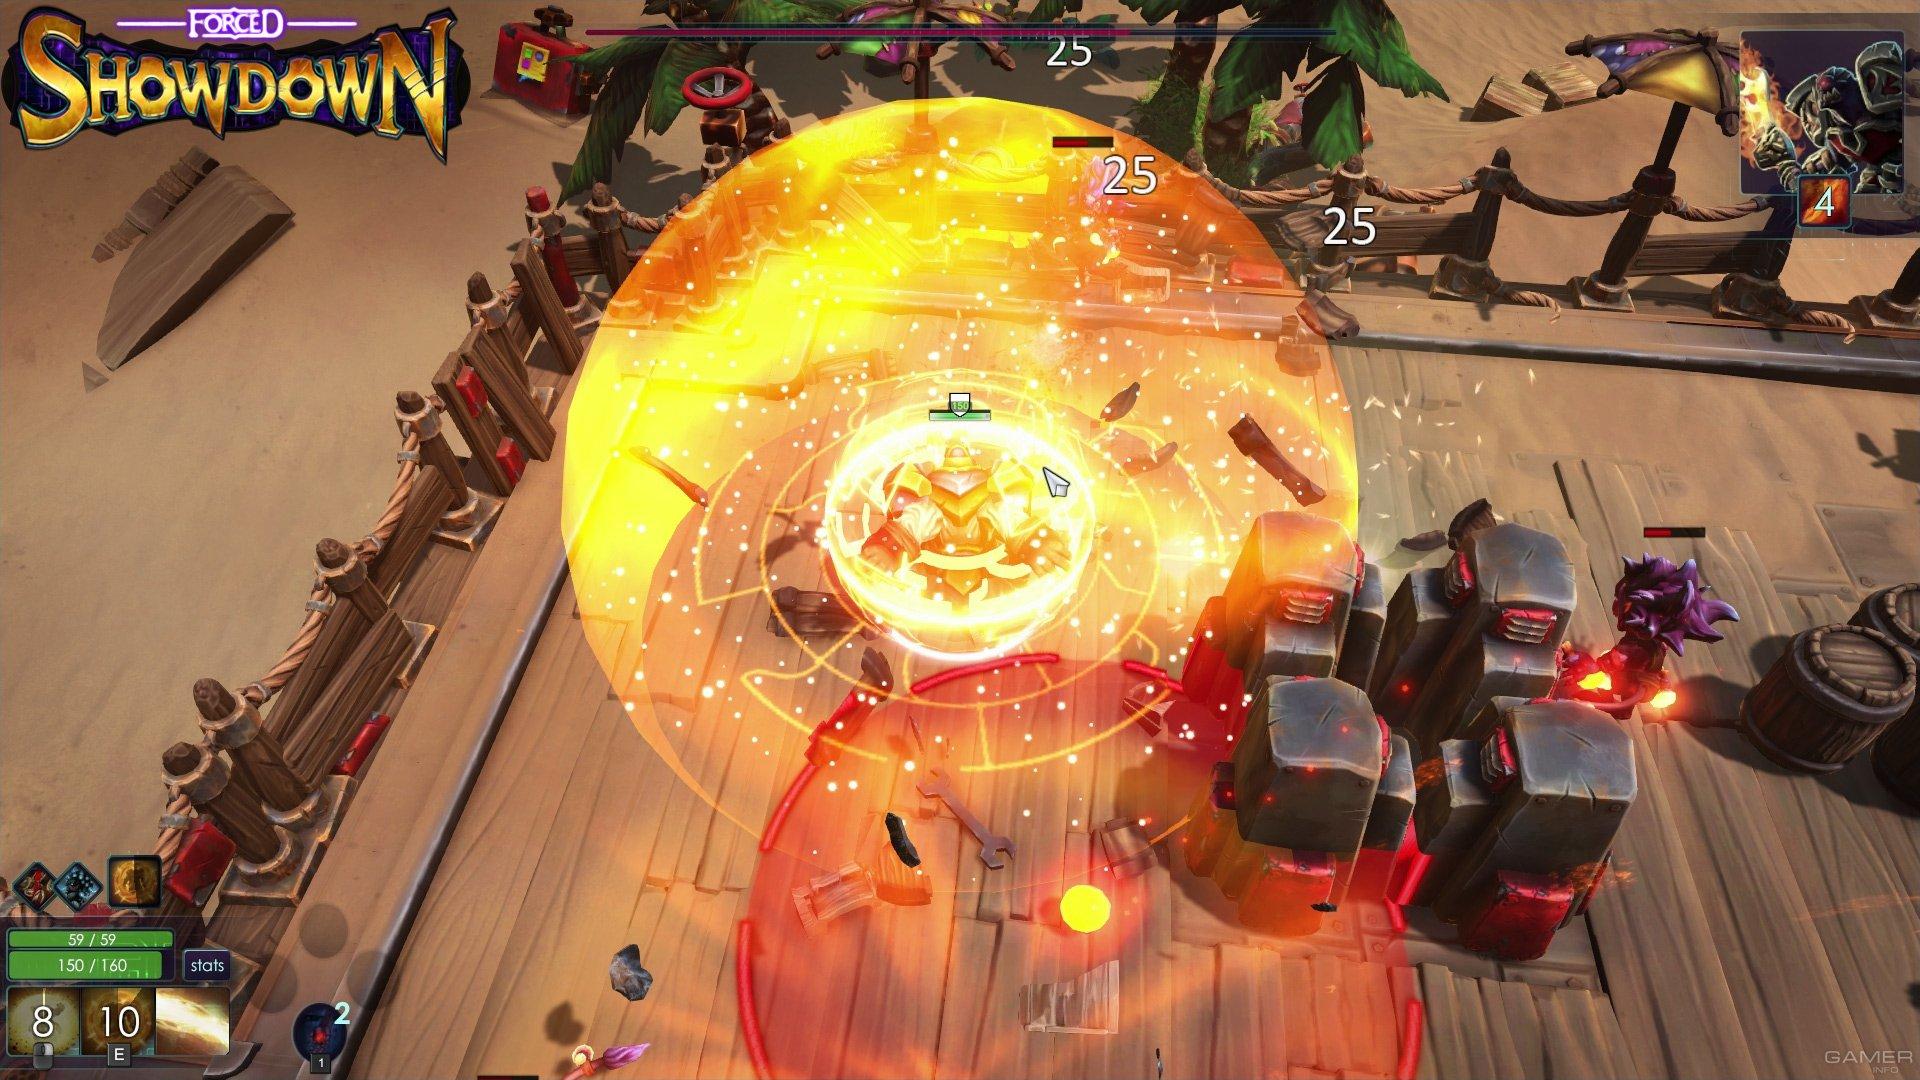 Forced Showdown Gameplay forced showdown (2016 video game)